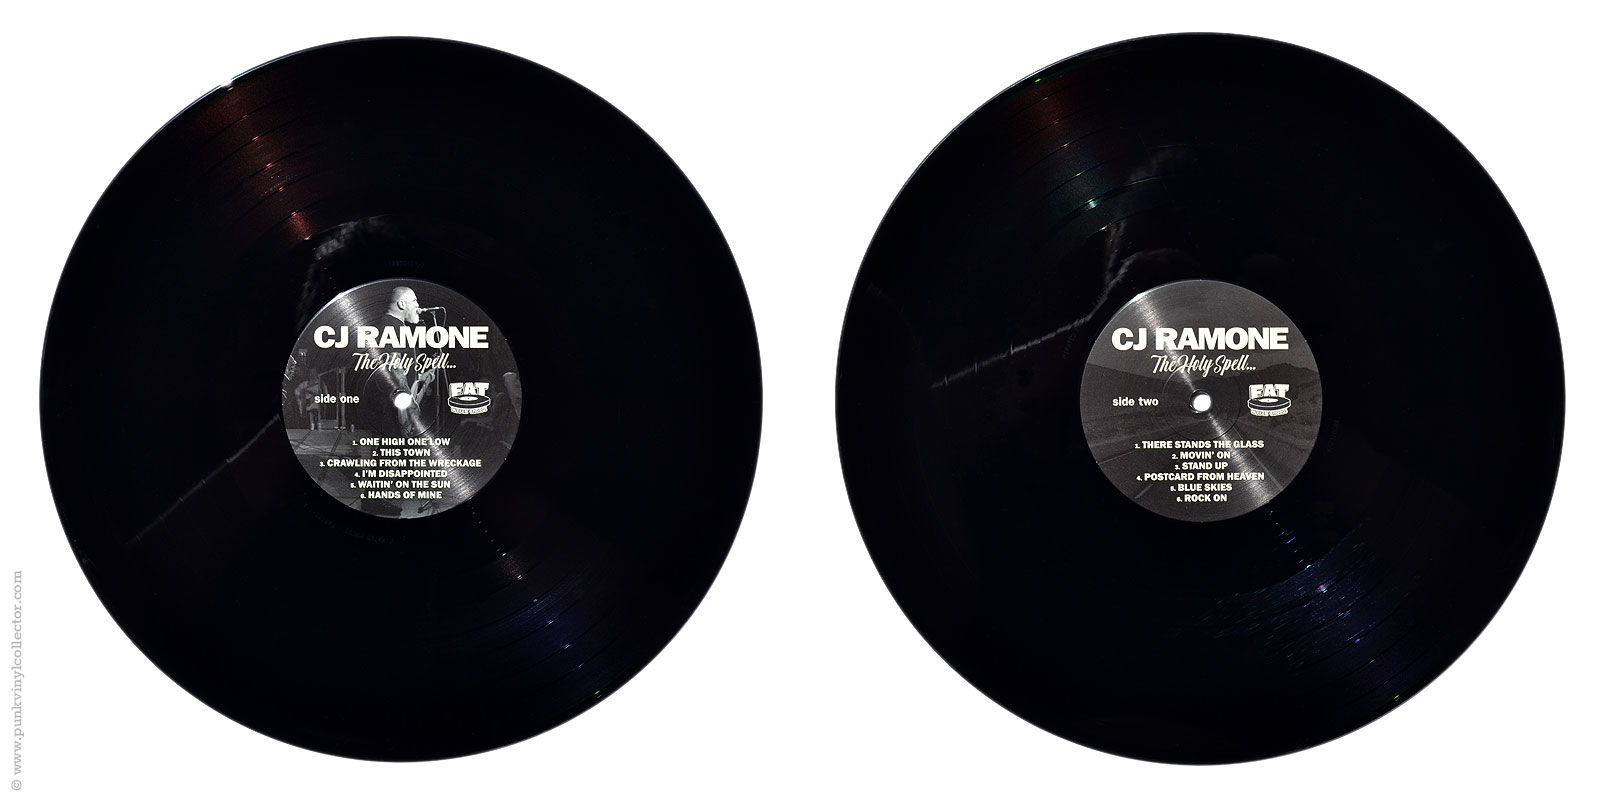 Cj Ramone Punk Vinyl Collector